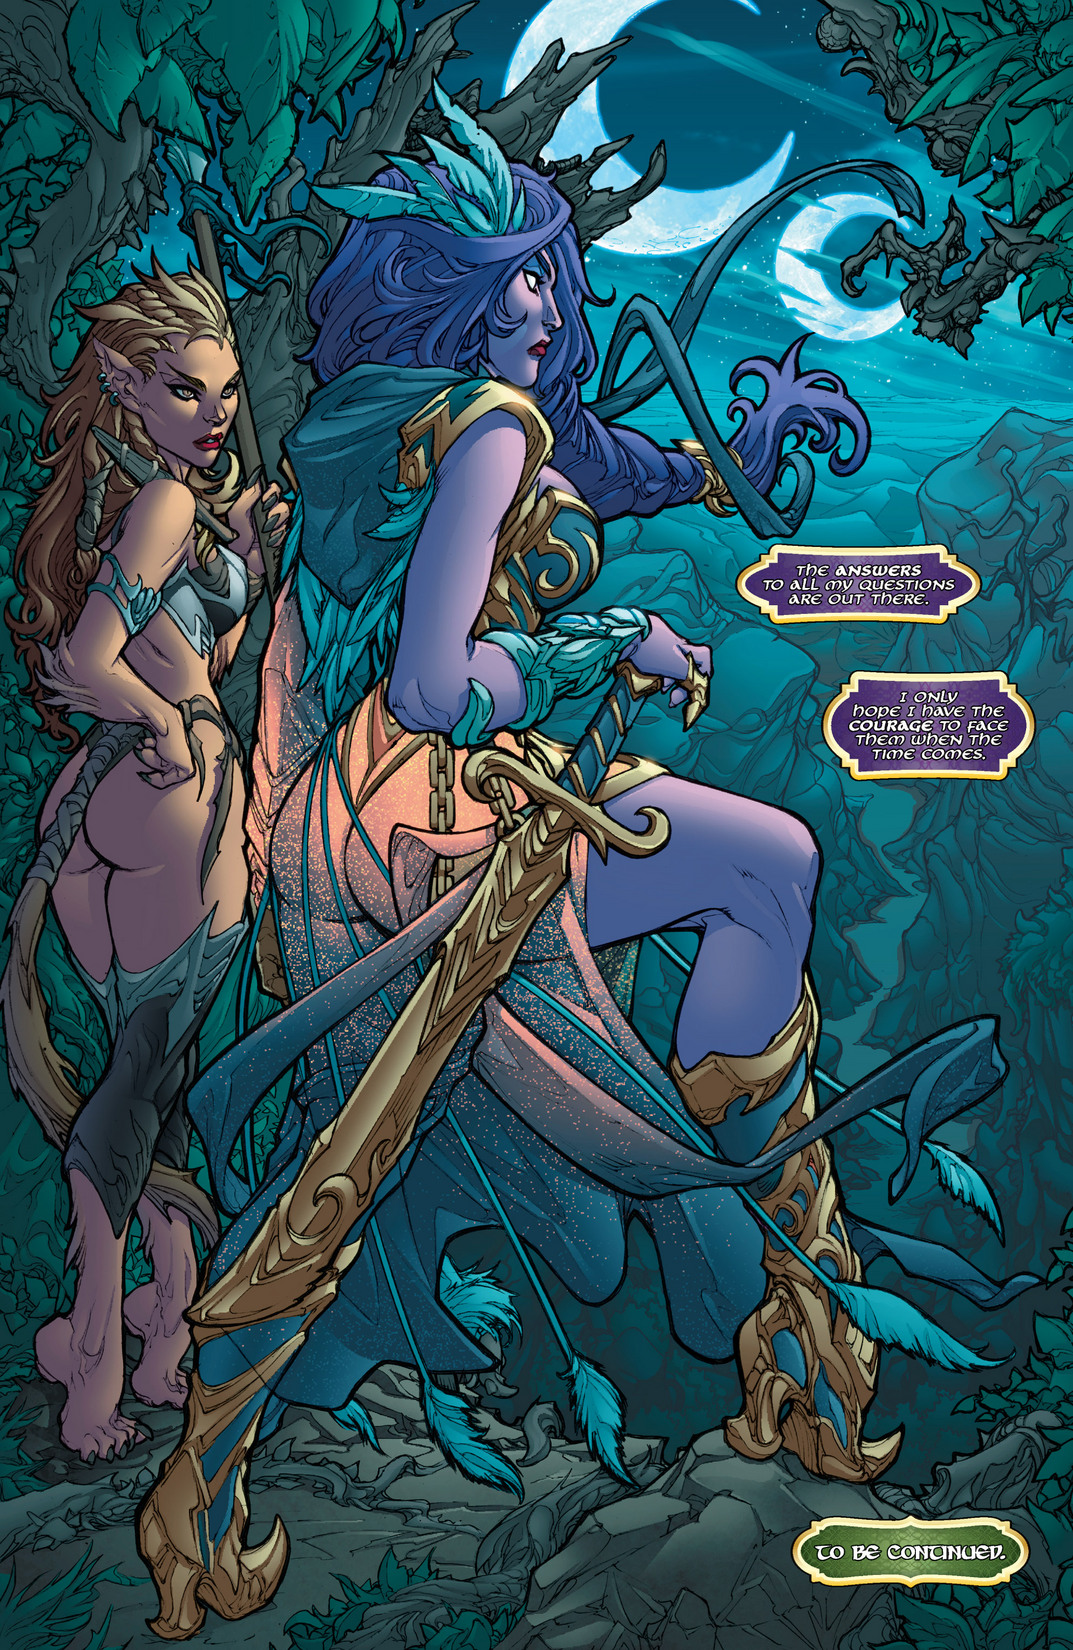 Read online Jirni comic -  Issue #1 - 22